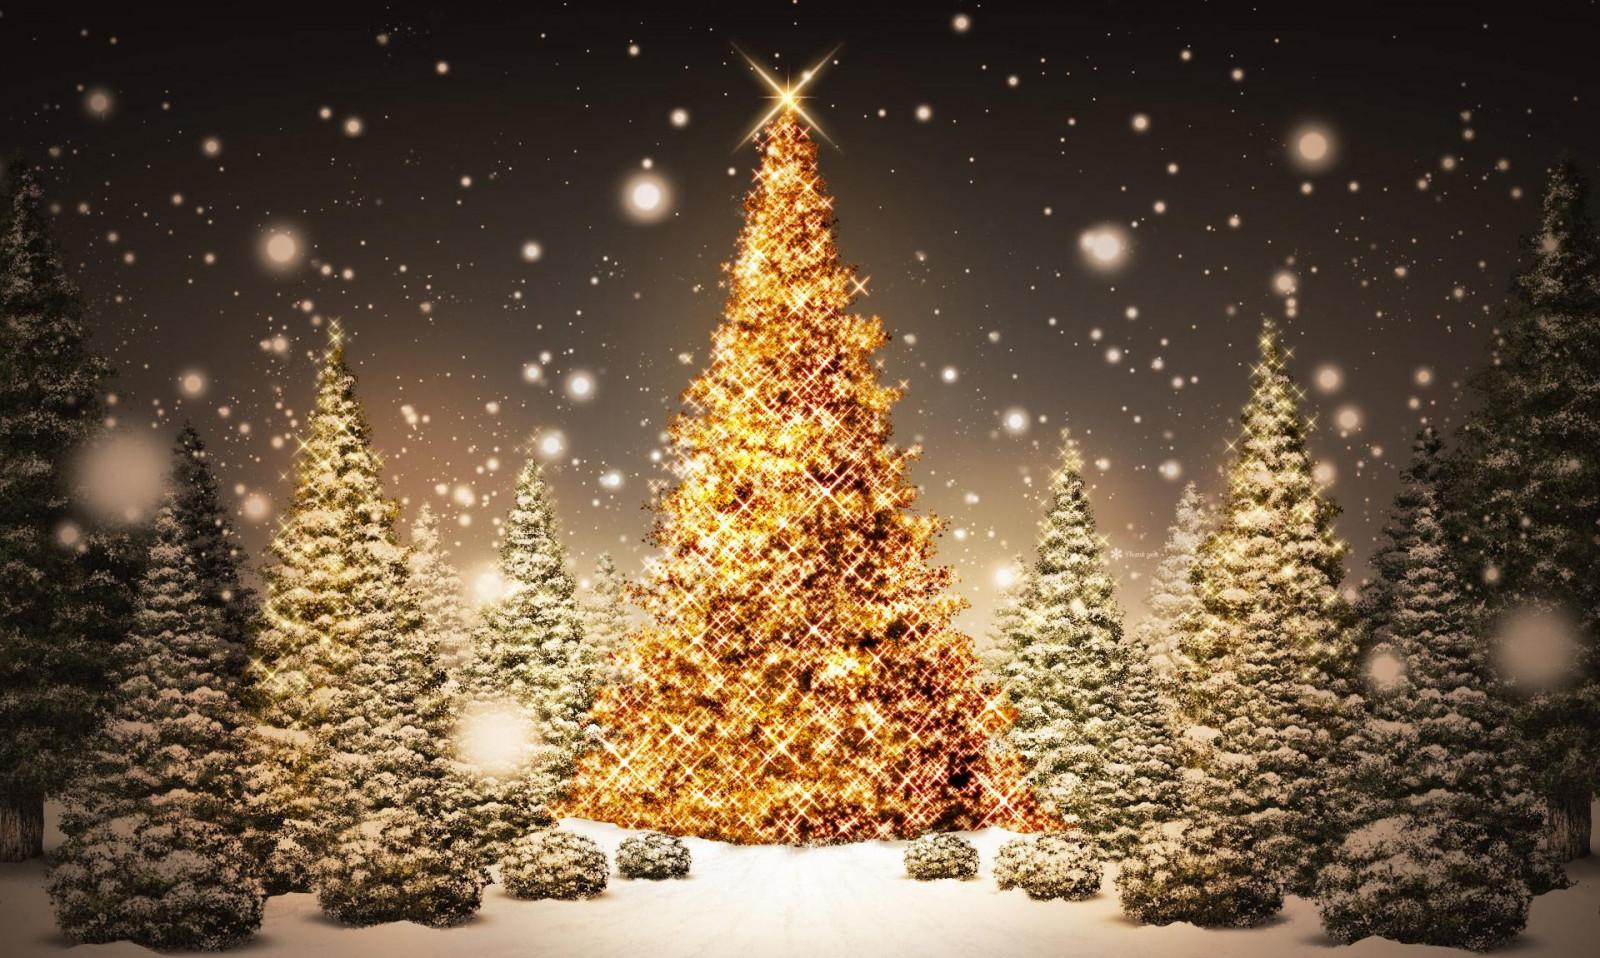 Картинки новогоднюю тему